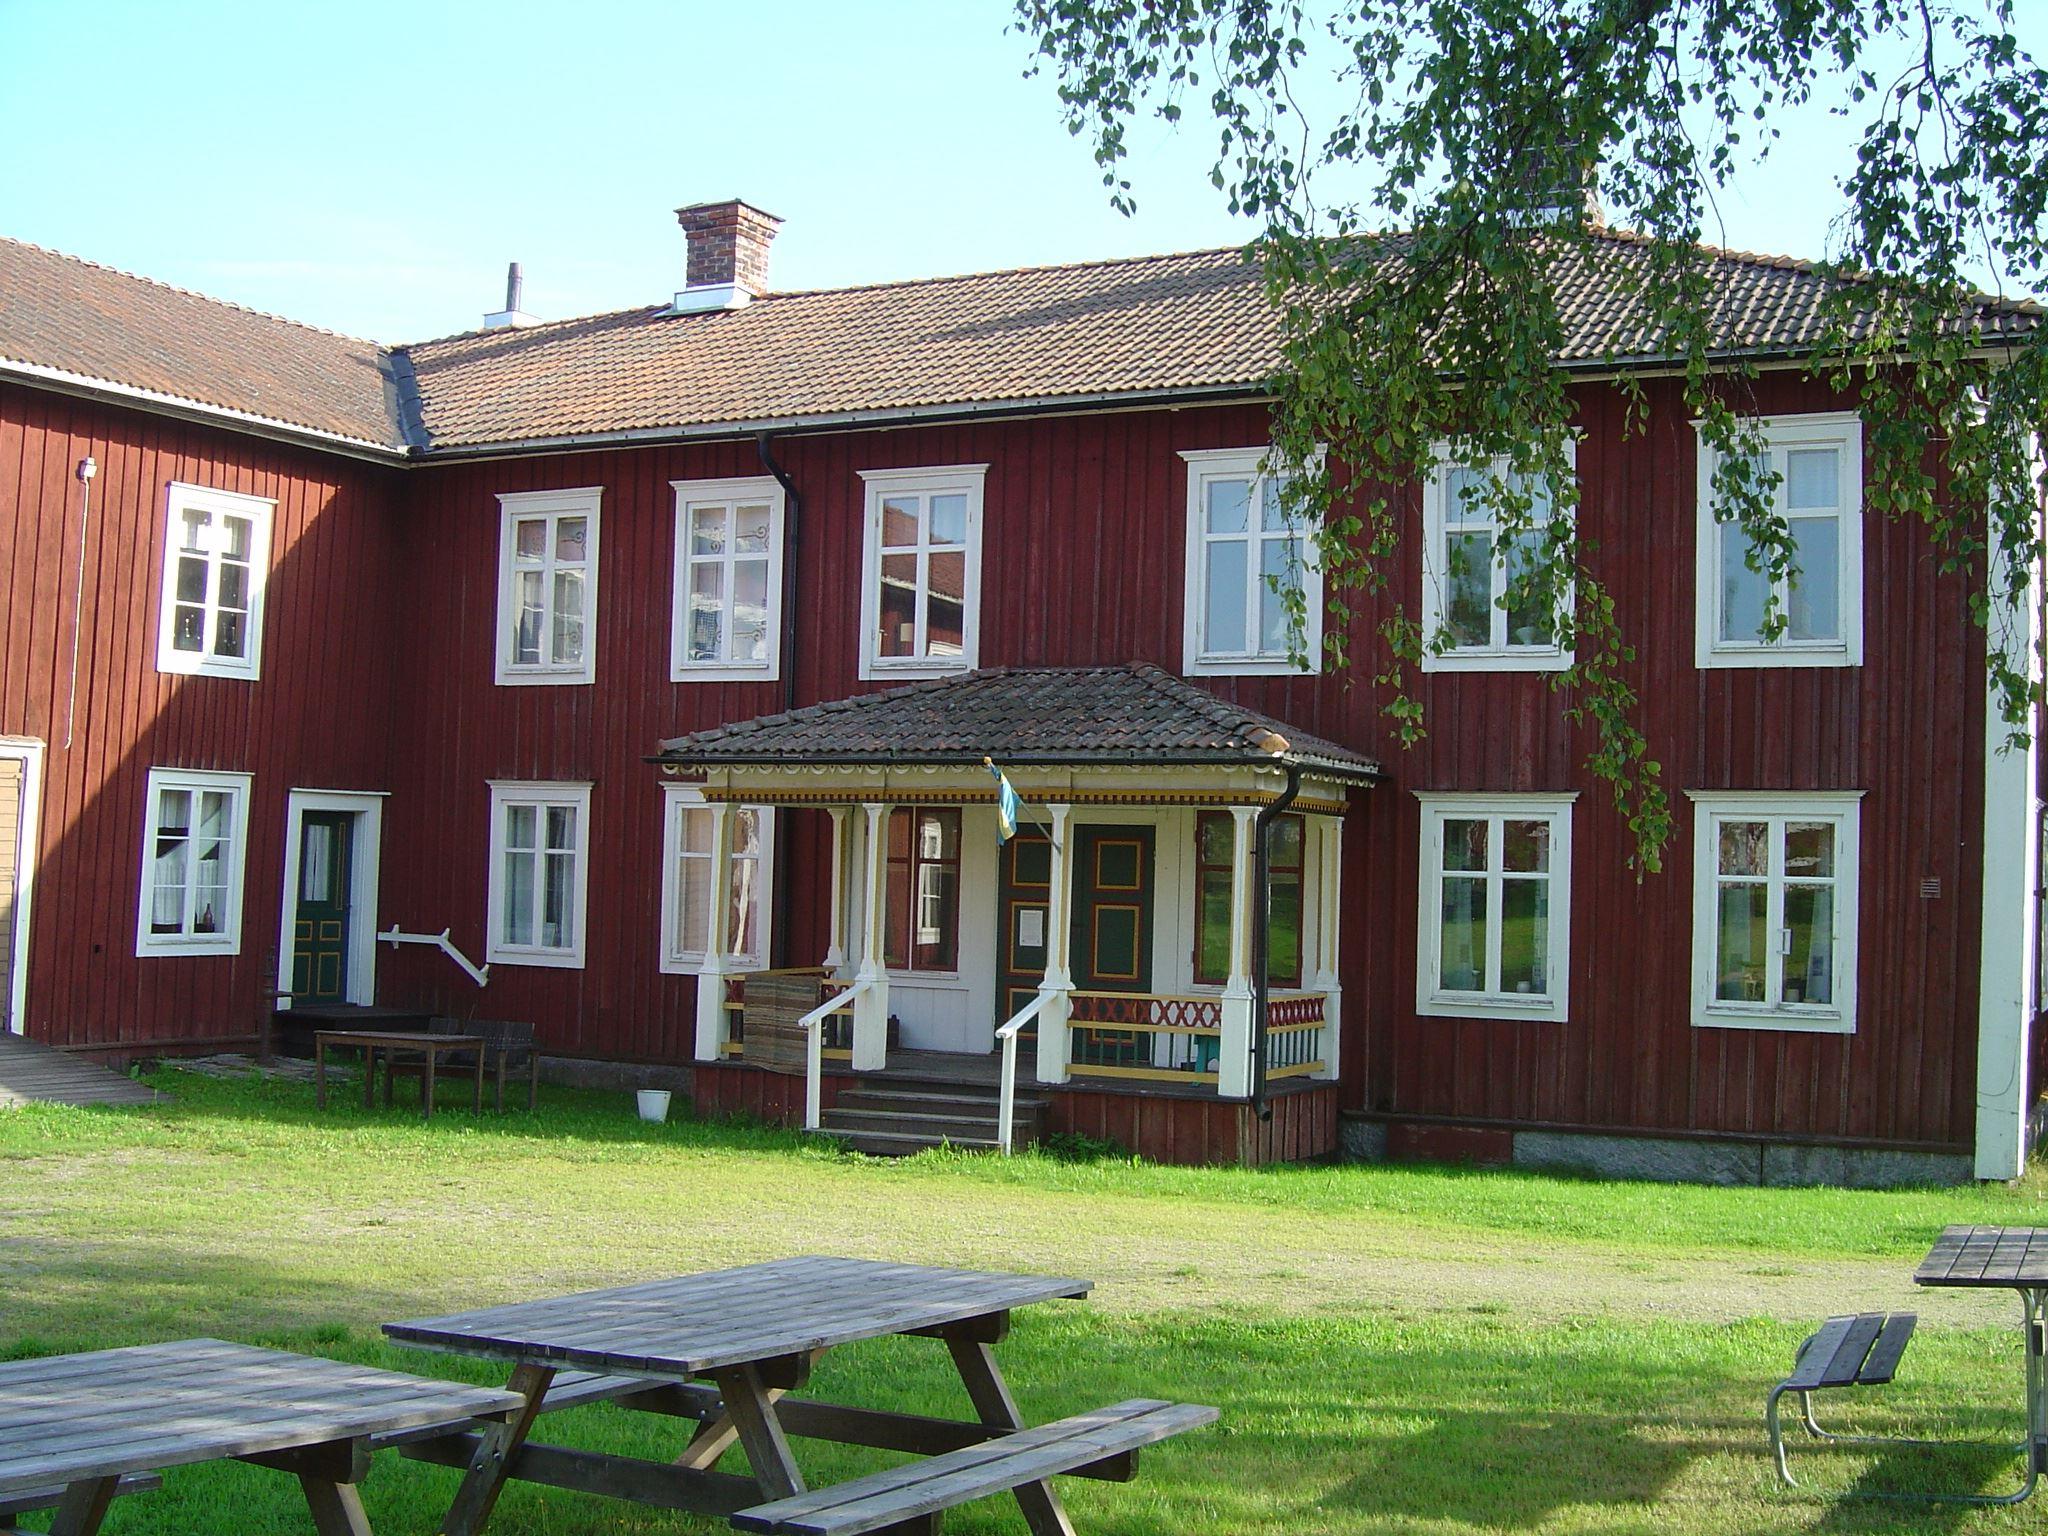 arkiv Nordanstigs turistbyrå,  © arkiv Nordanstigs turistbyrå, Jättendals Hembygdsgård